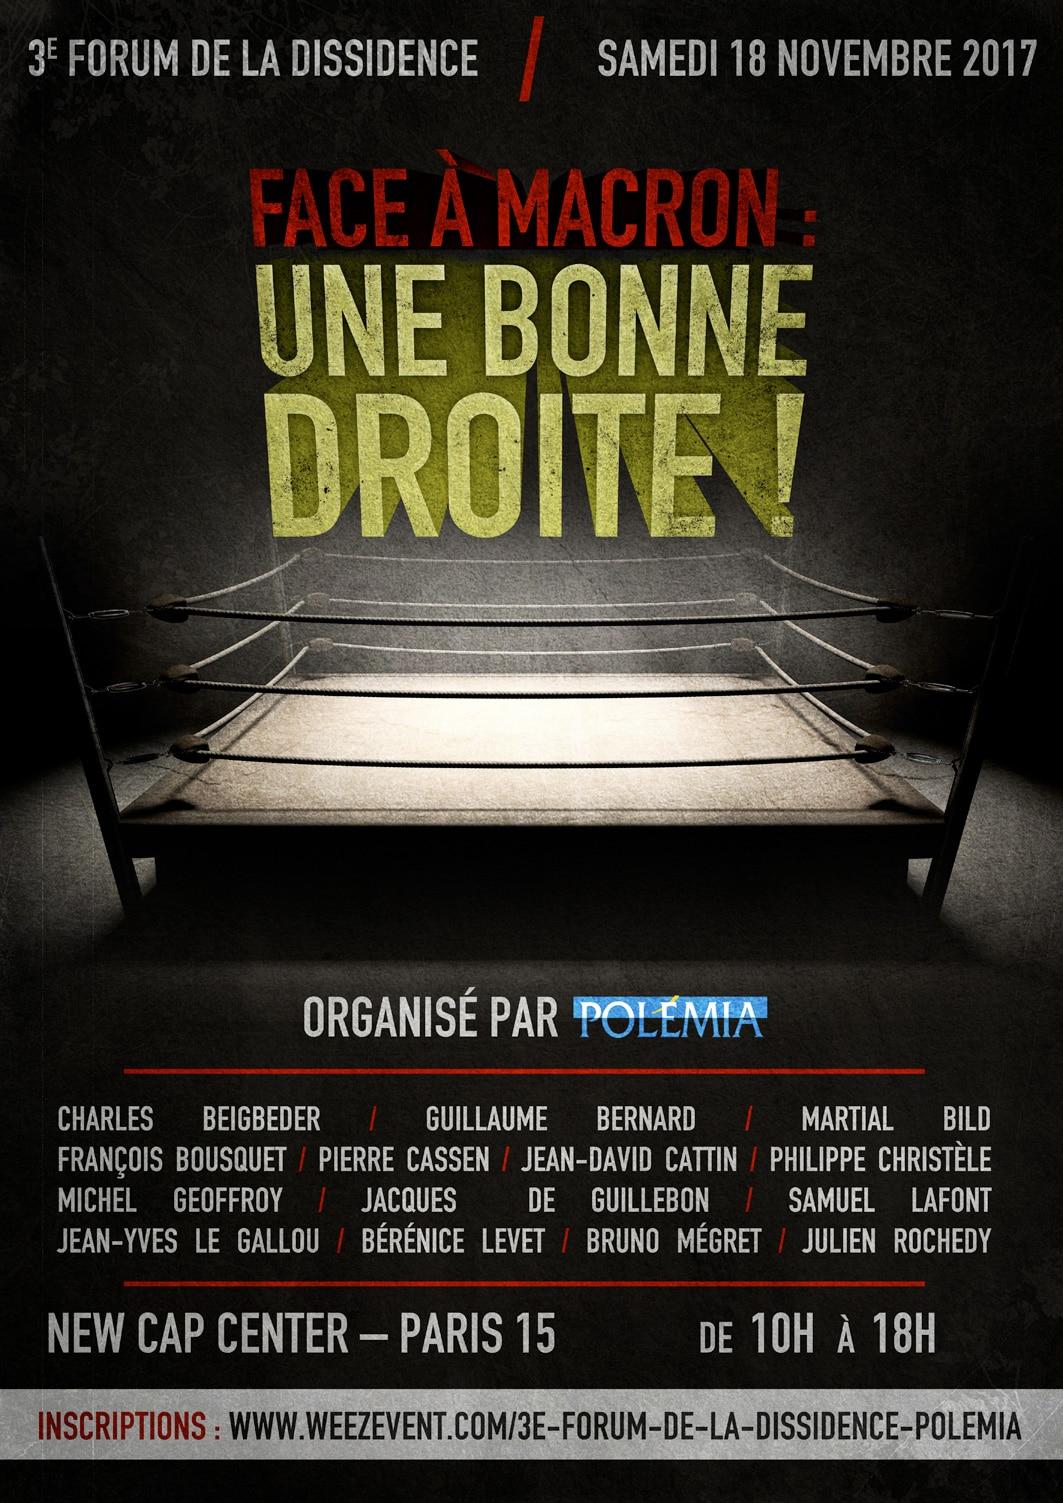 Polémia Forum de la Dissidence Macron Droite